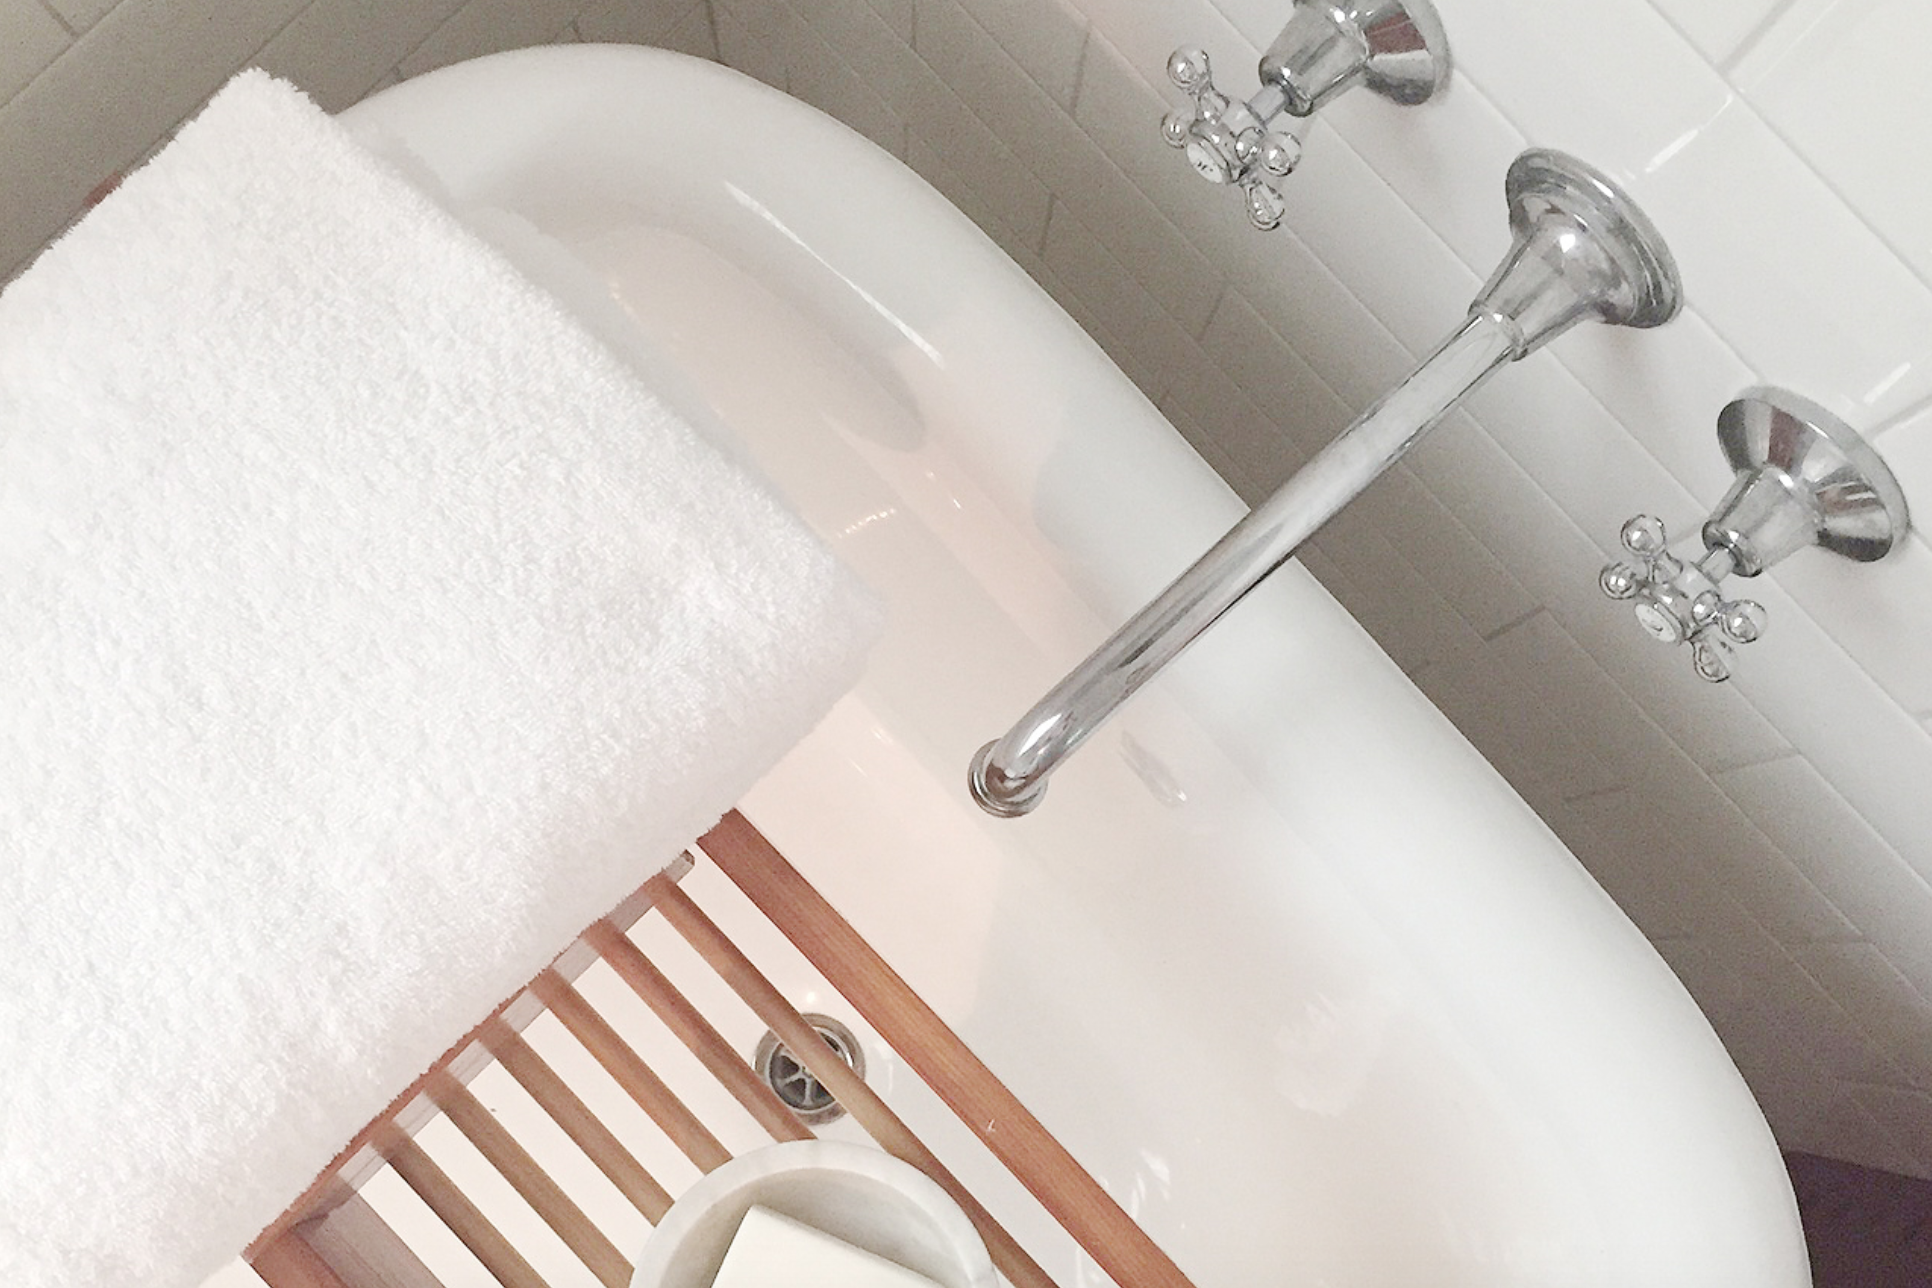 DETOX YOUR BATHROOM 101